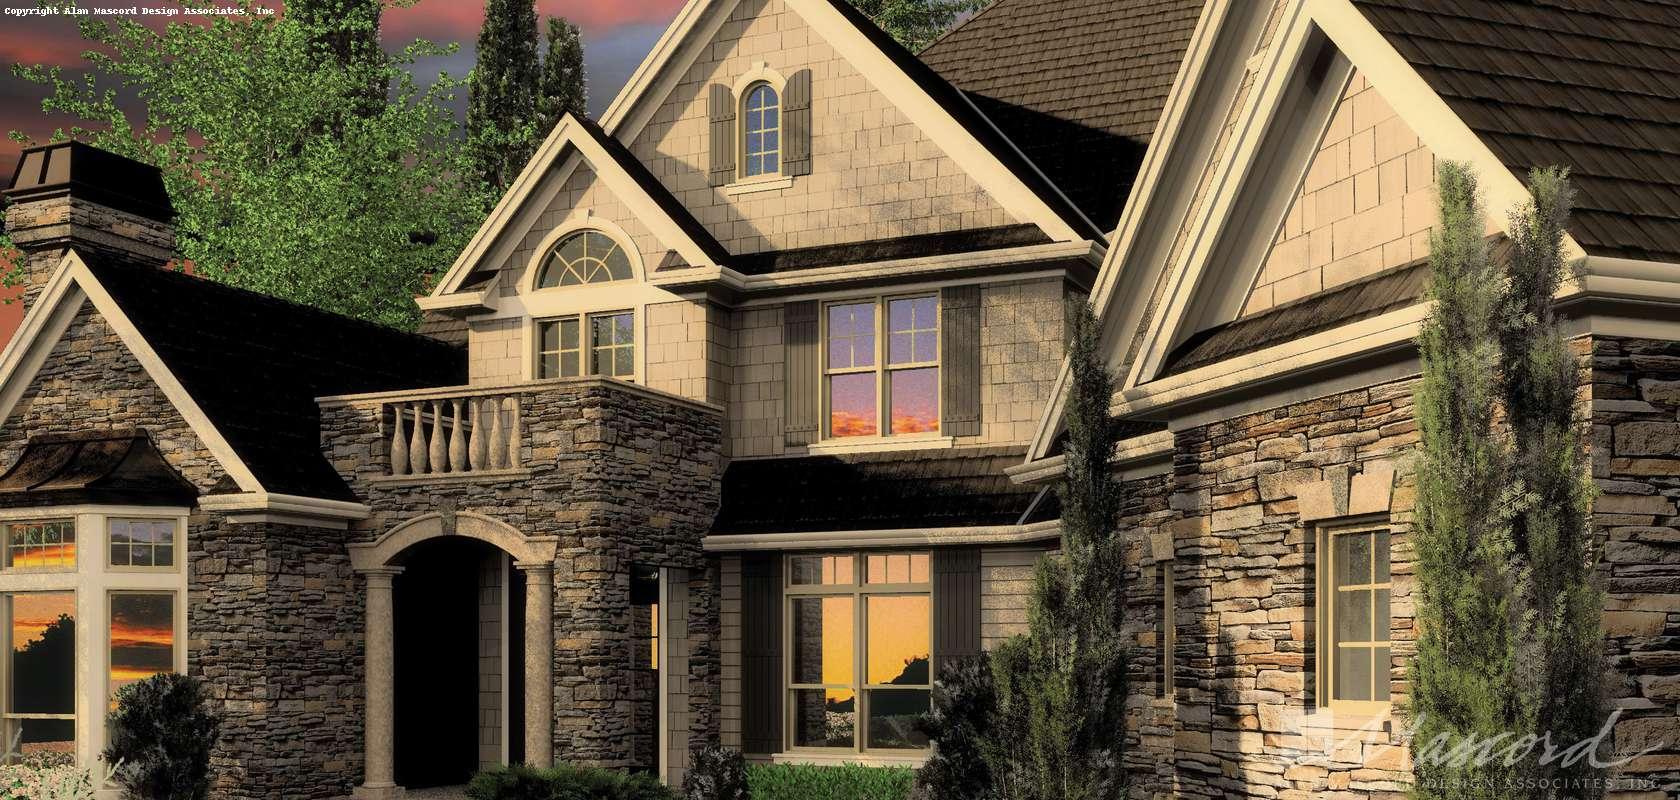 Mascord House Plan 2449: The Hallsville